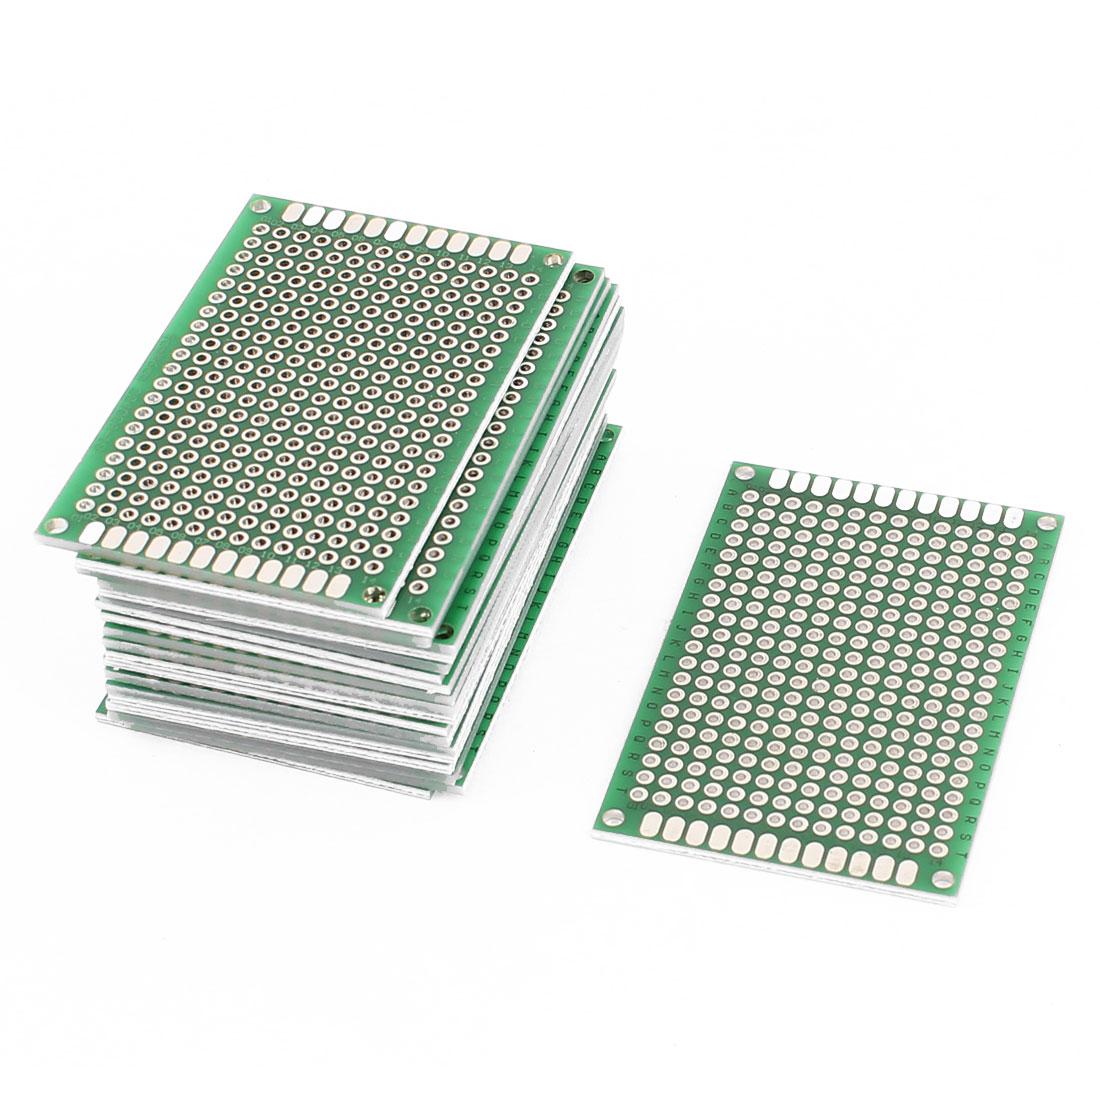 20Pcs Double-Side Prototype Solderable Paper Universal PCB Board 4x6cm